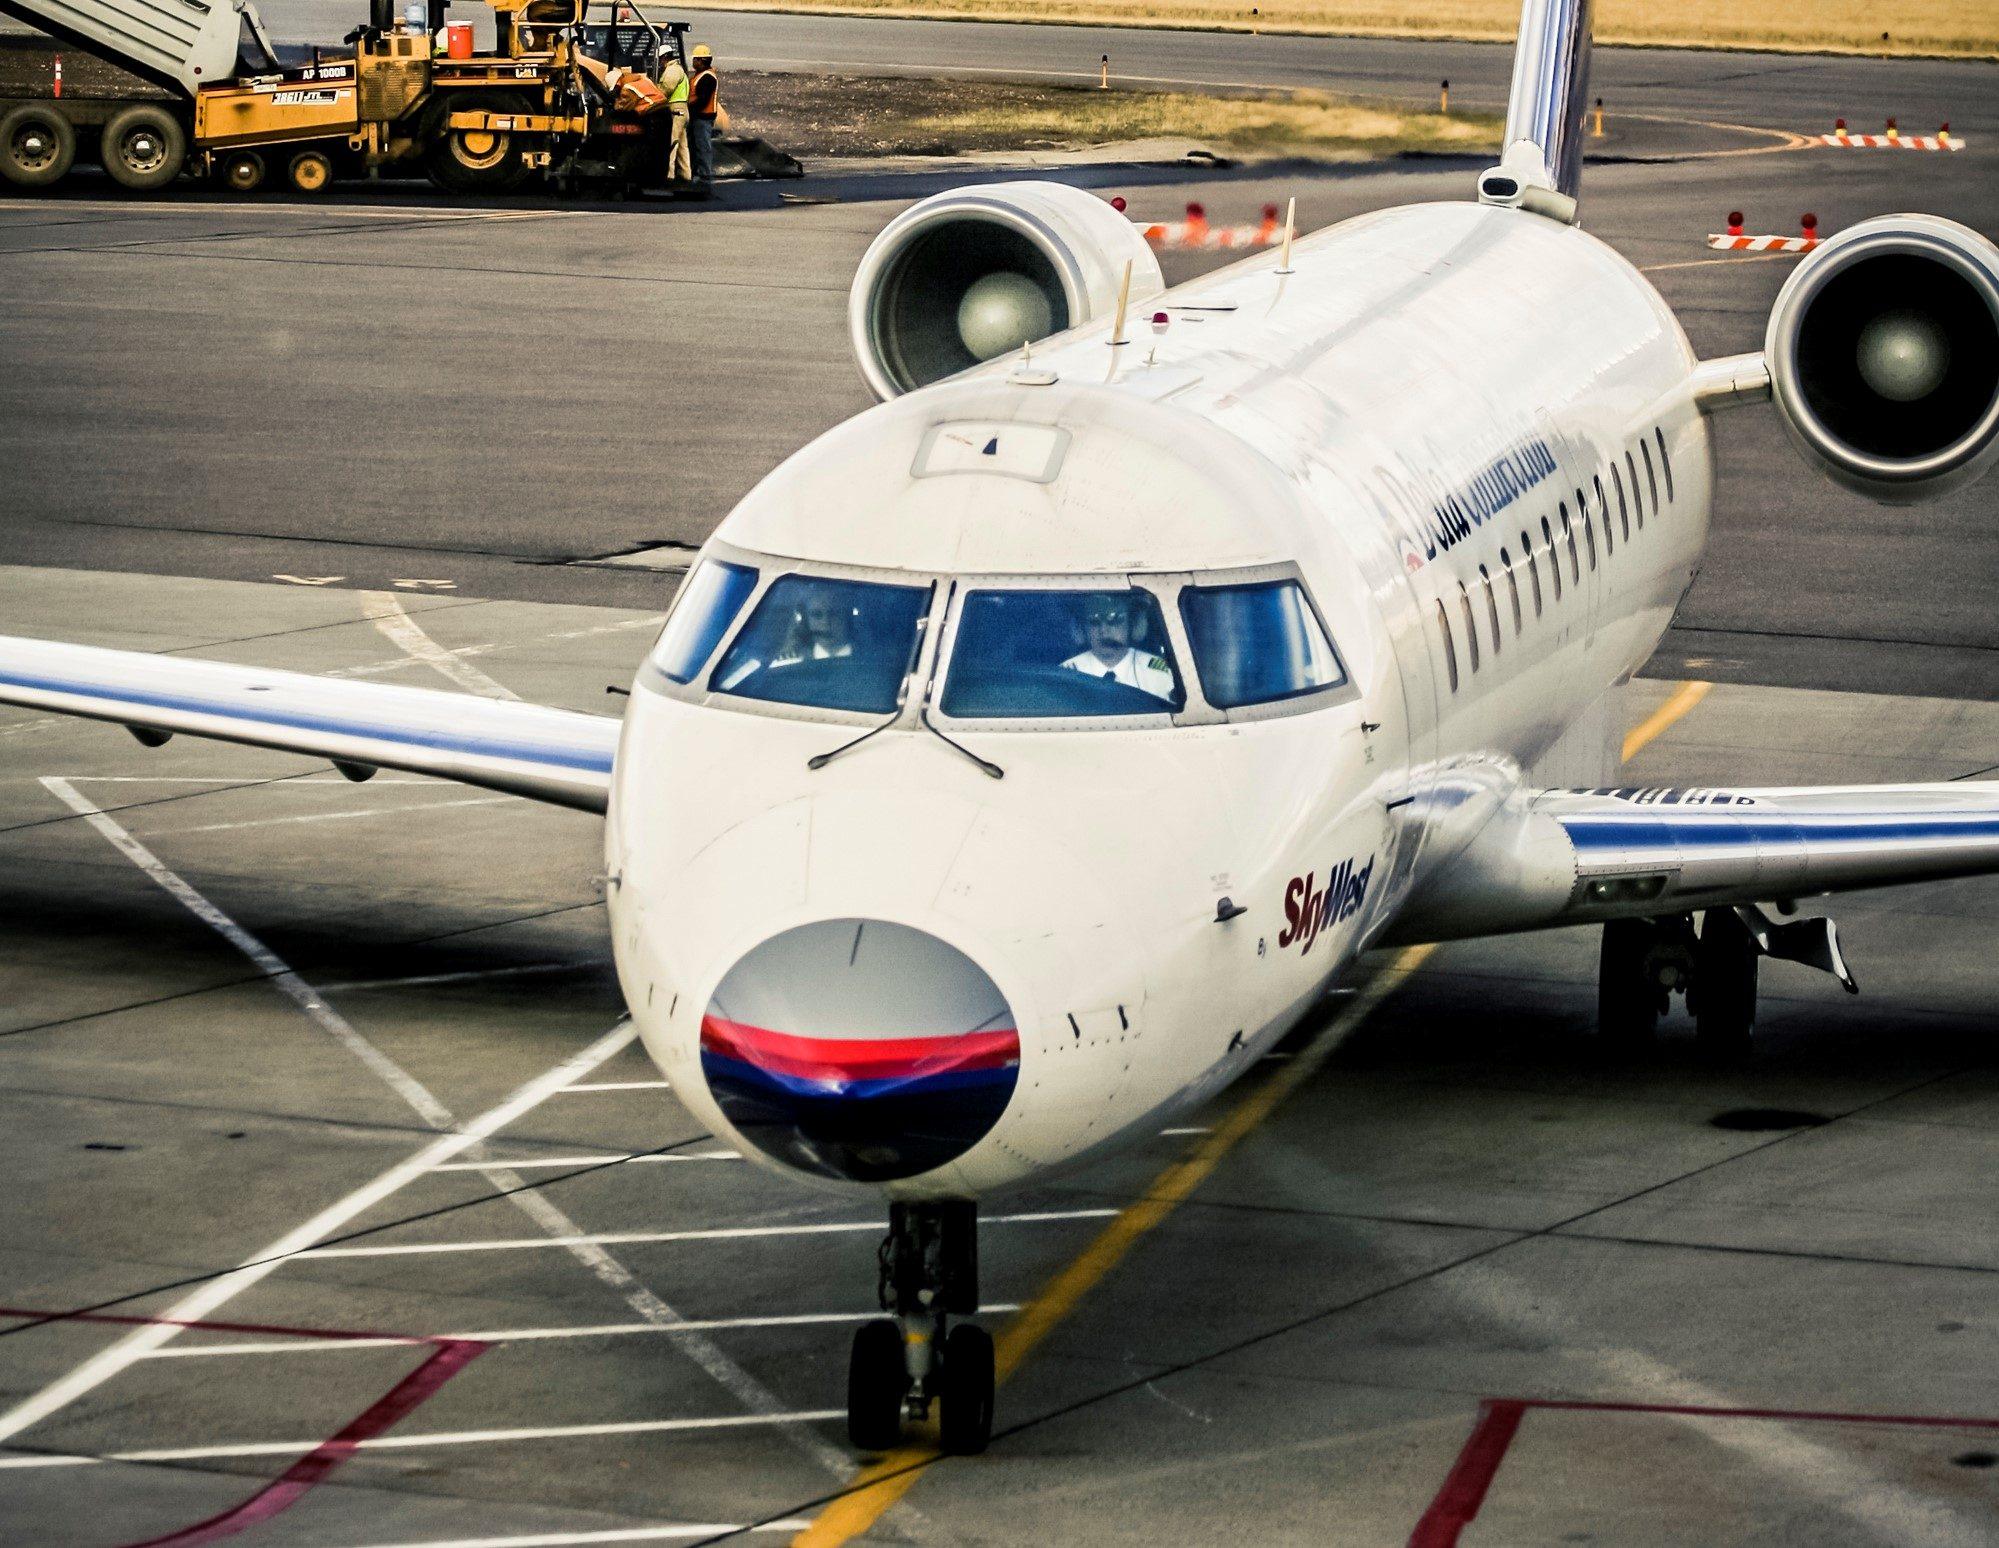 Skywest plane at gate